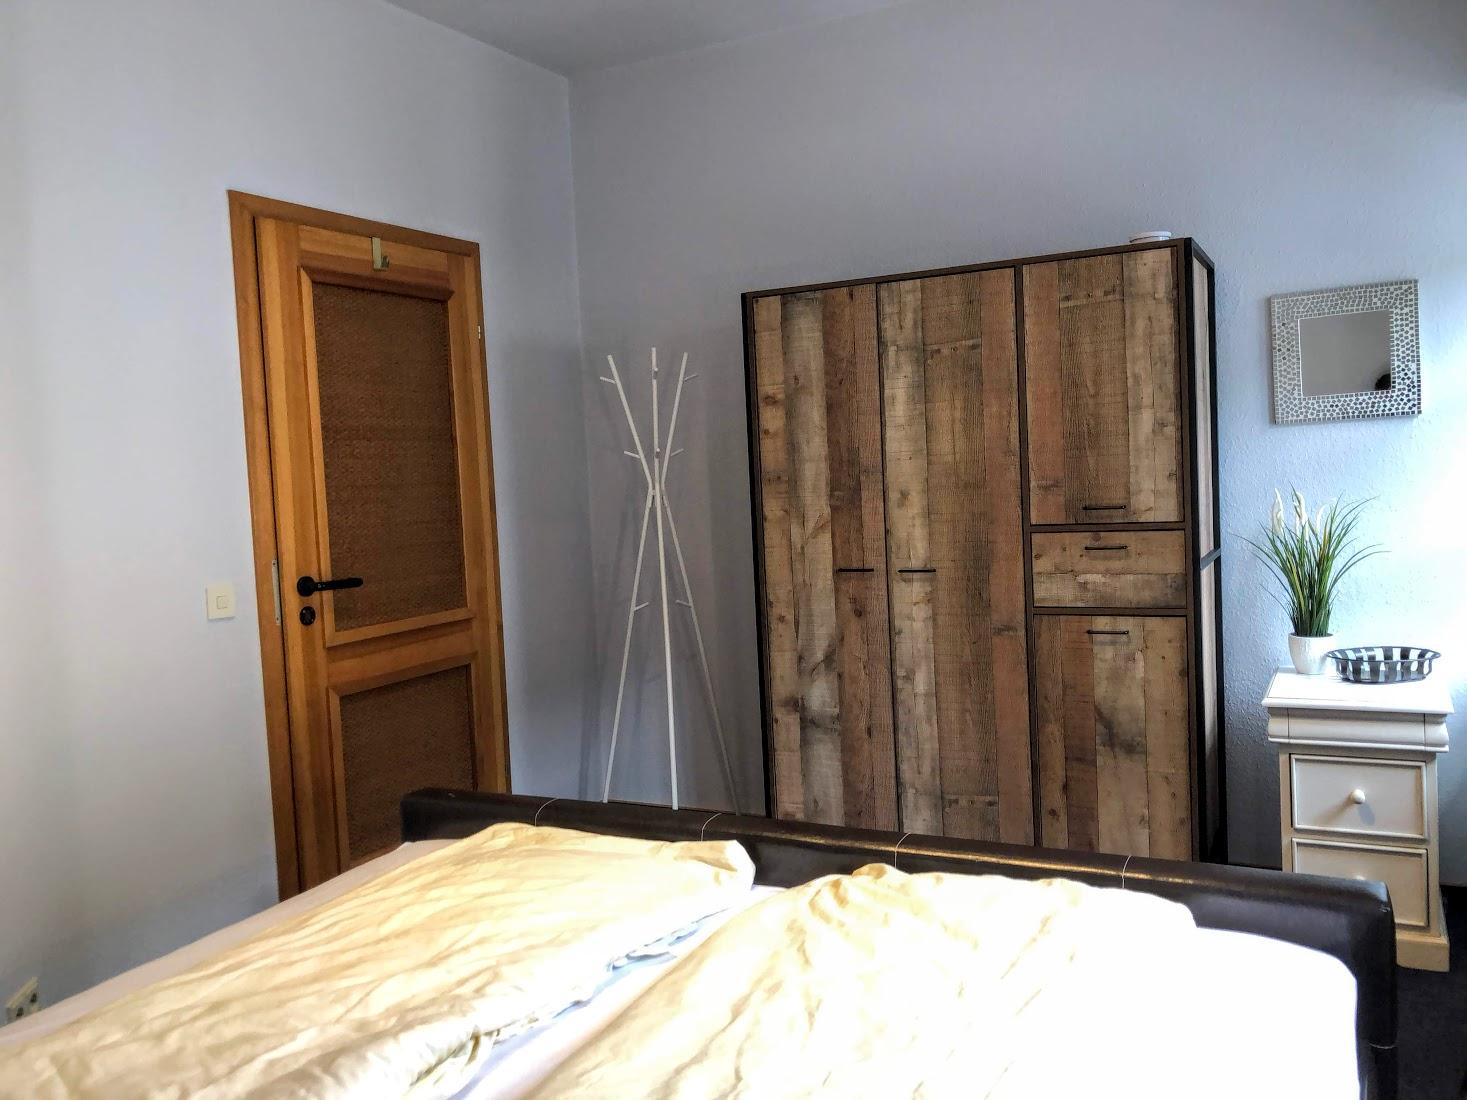 Plenty of storage in the 2nd bedroom